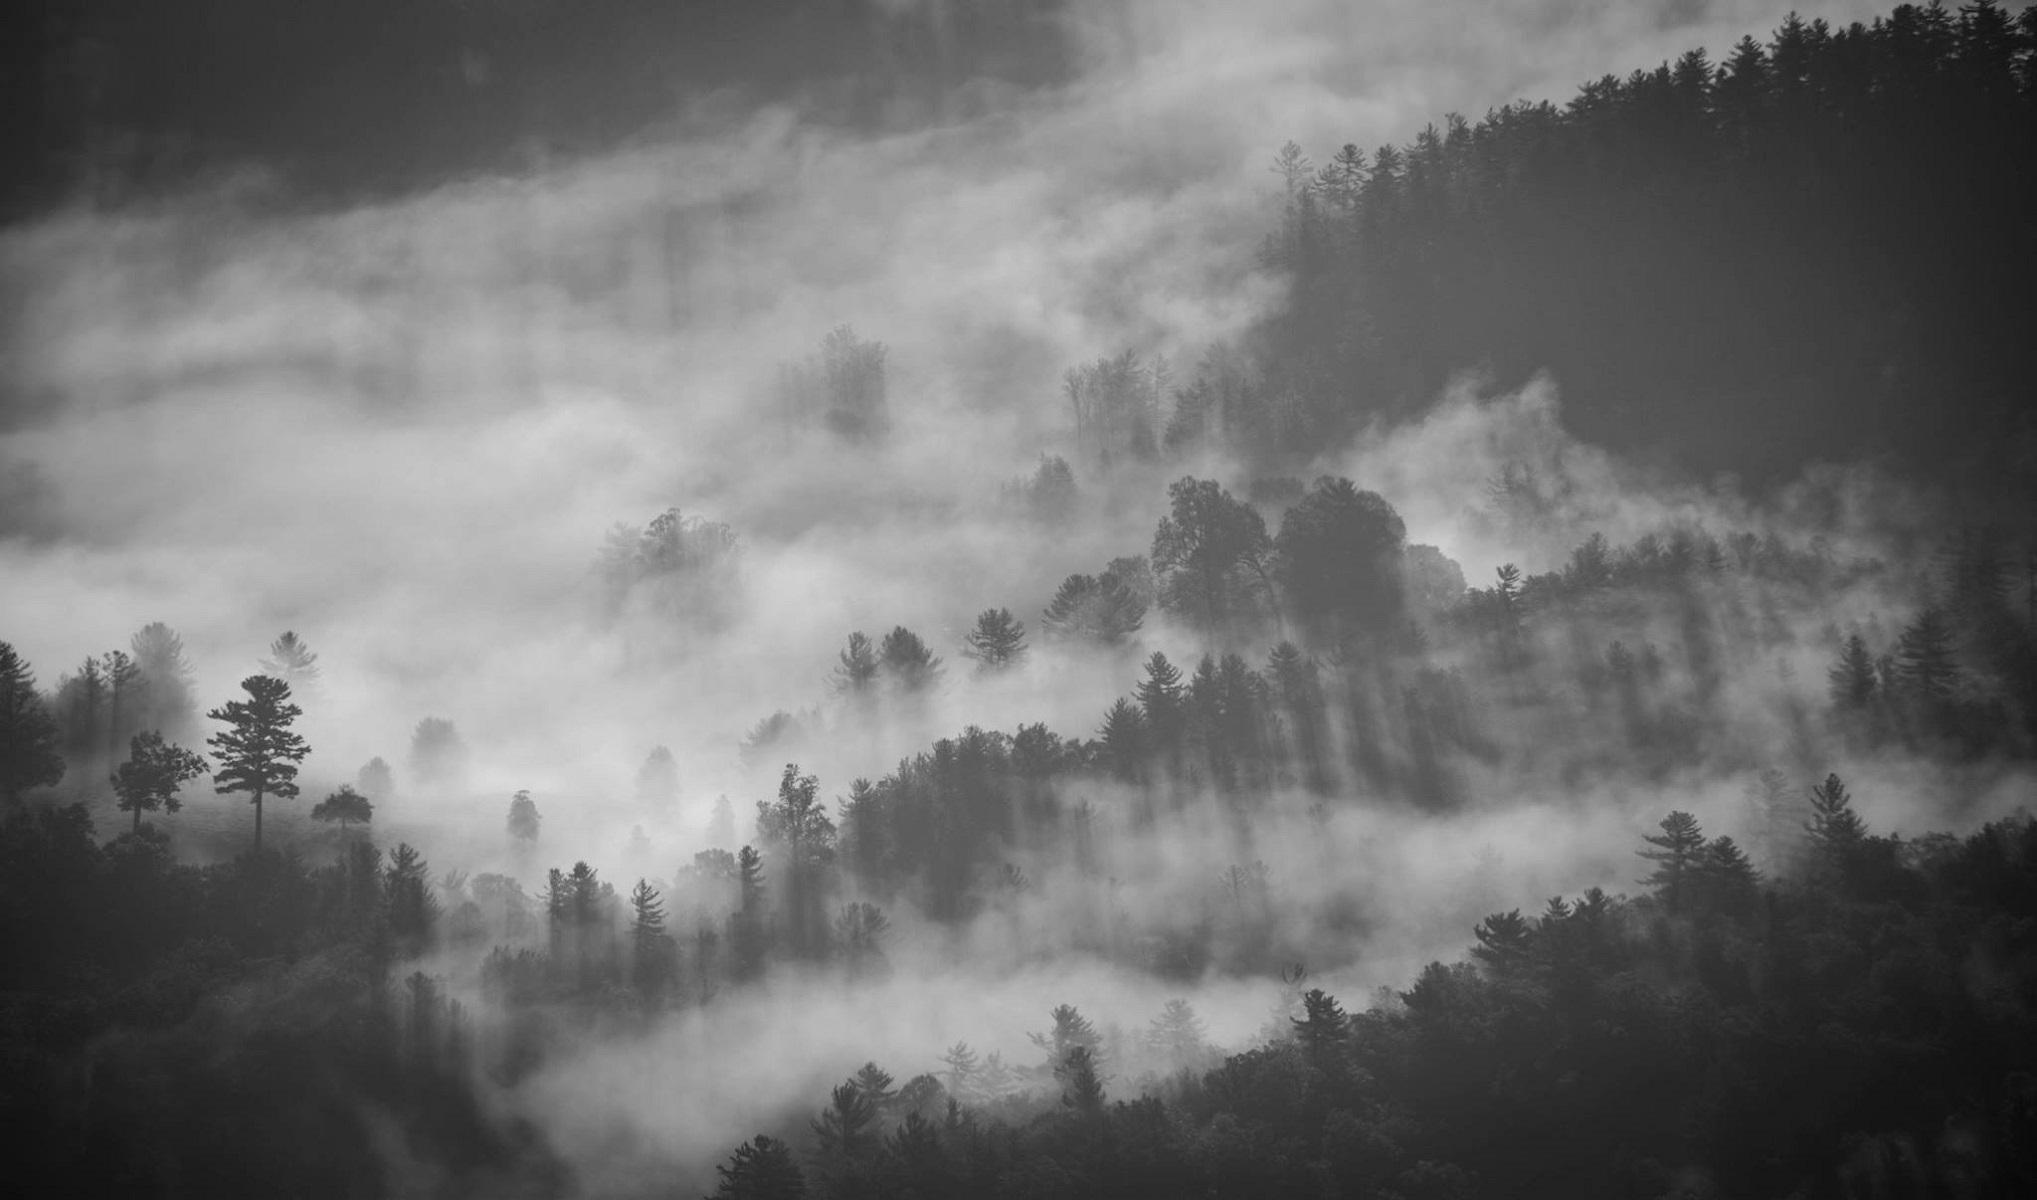 fog in forest wallpaper